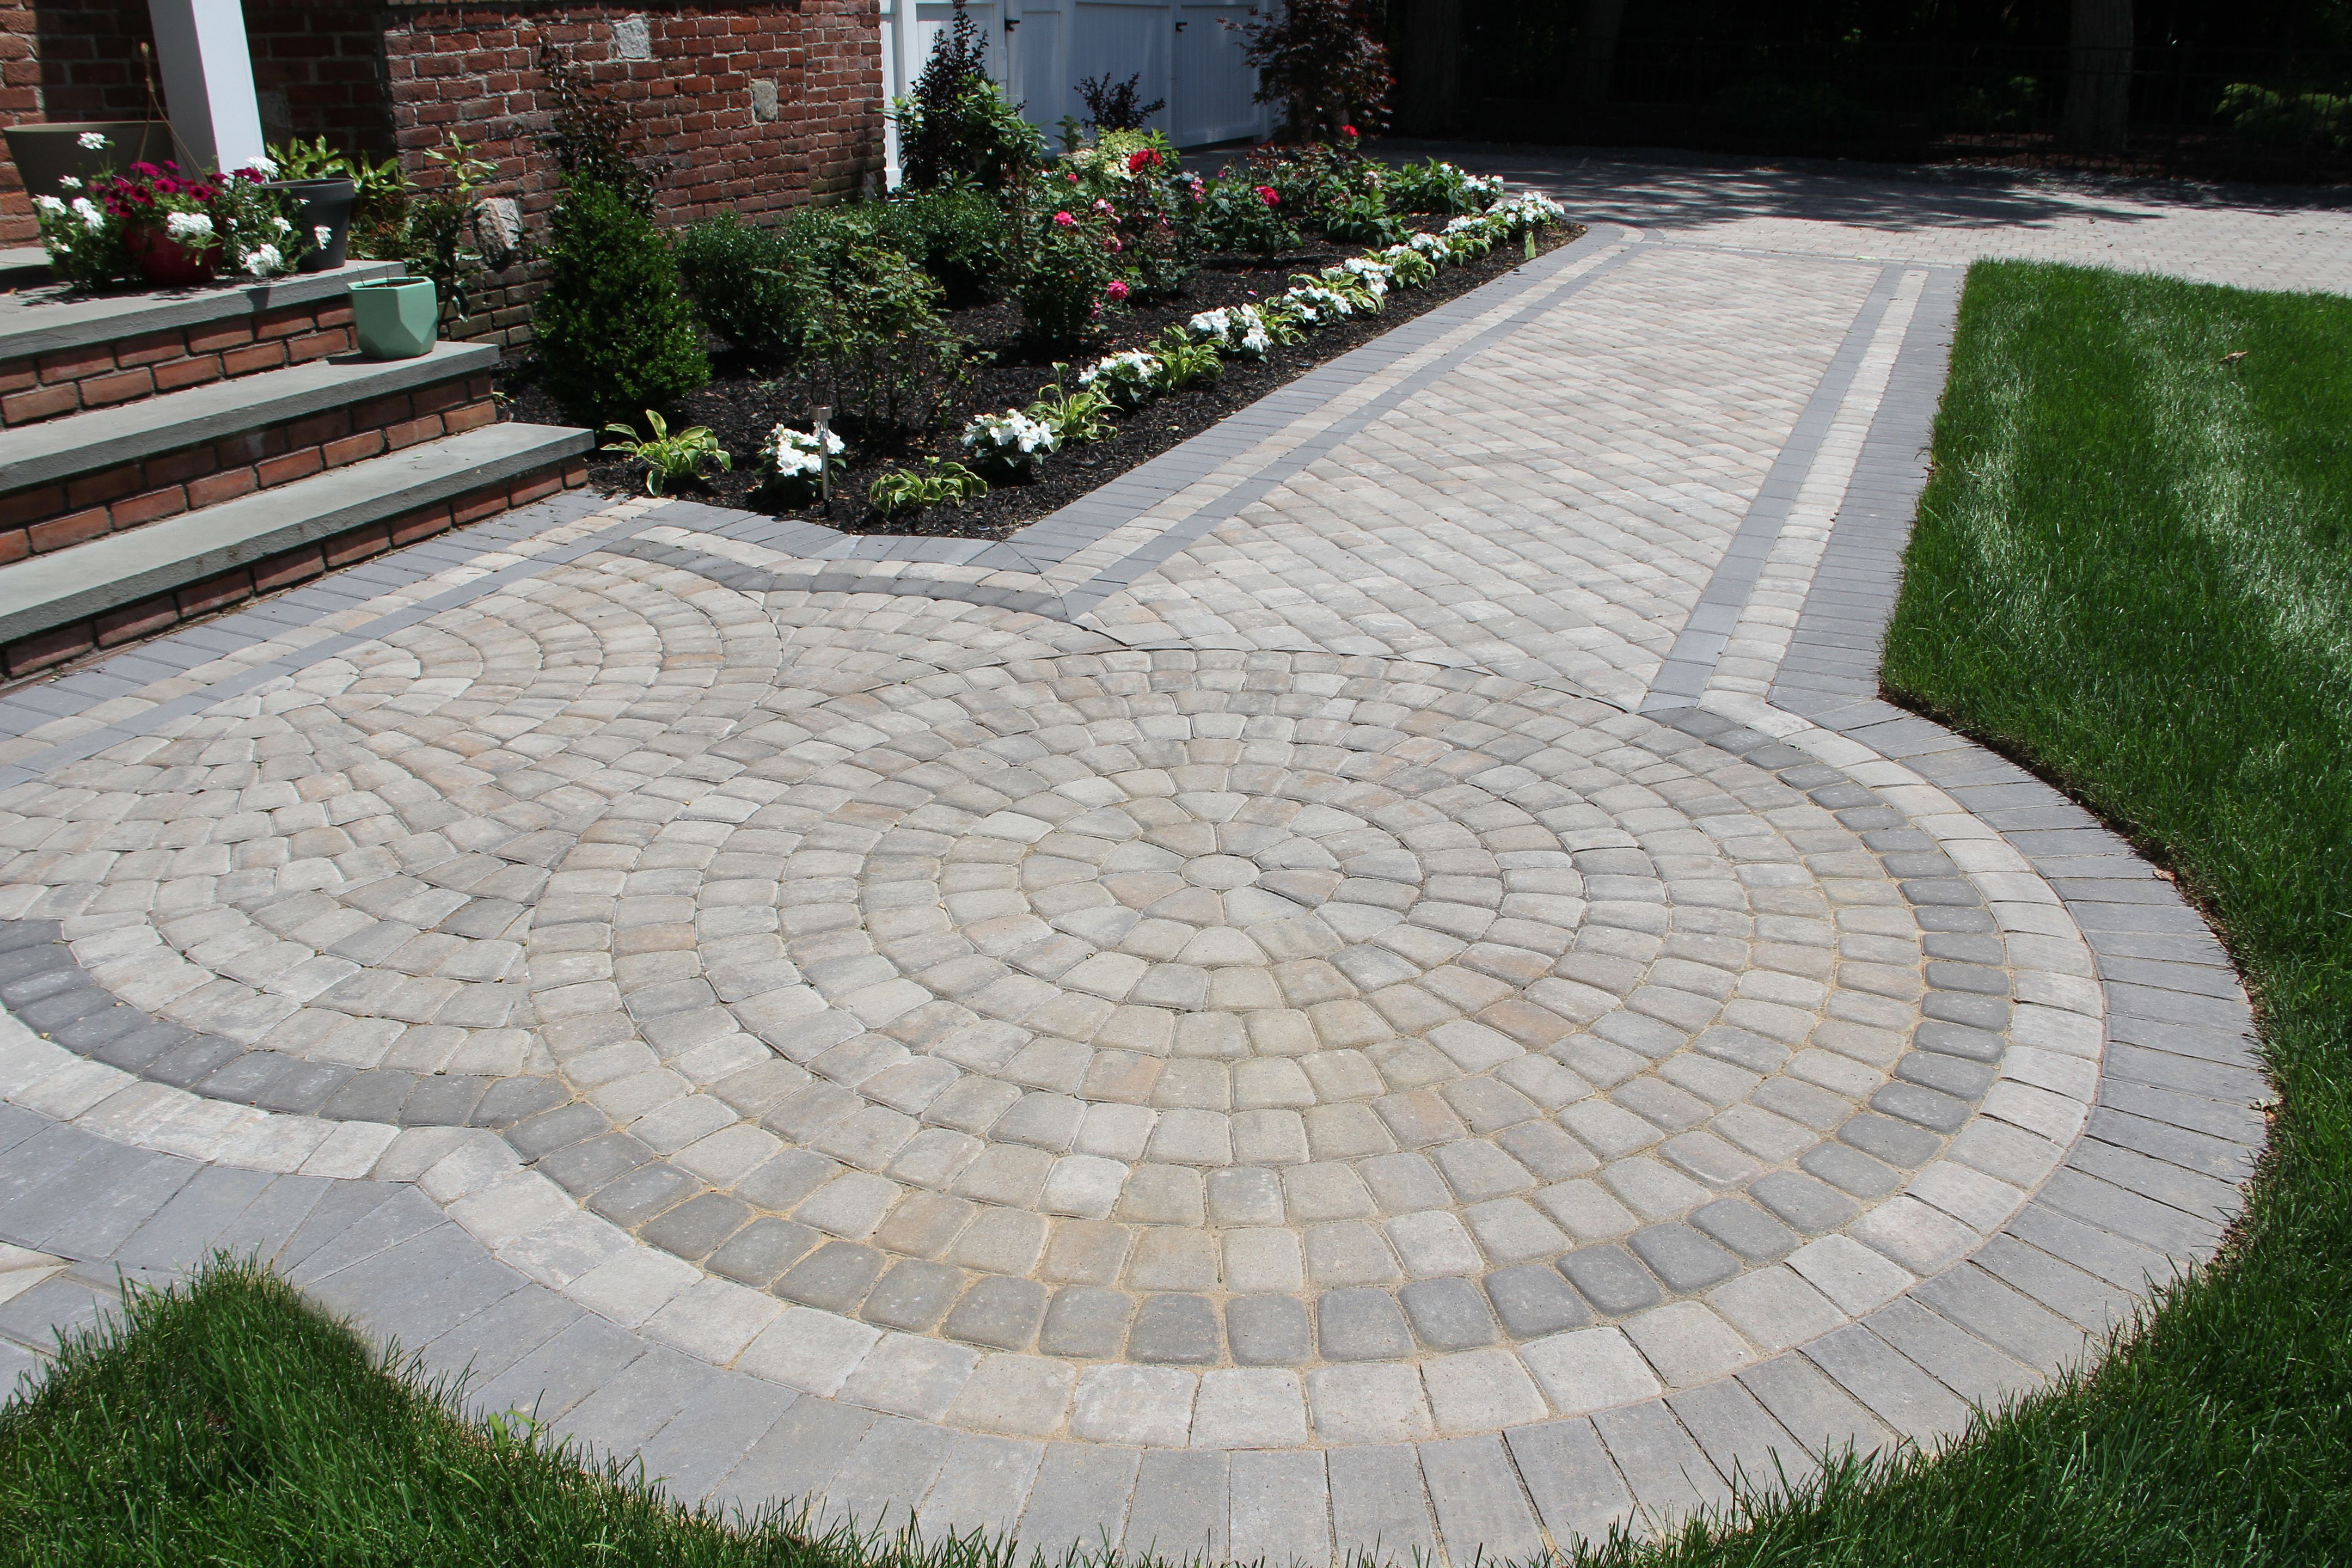 Sante Euro Circle Granite City Blend Paver Circle Accent Walkway Driveway Nicolock Paving Stones Paving Stones Stone Driveway Nicolock